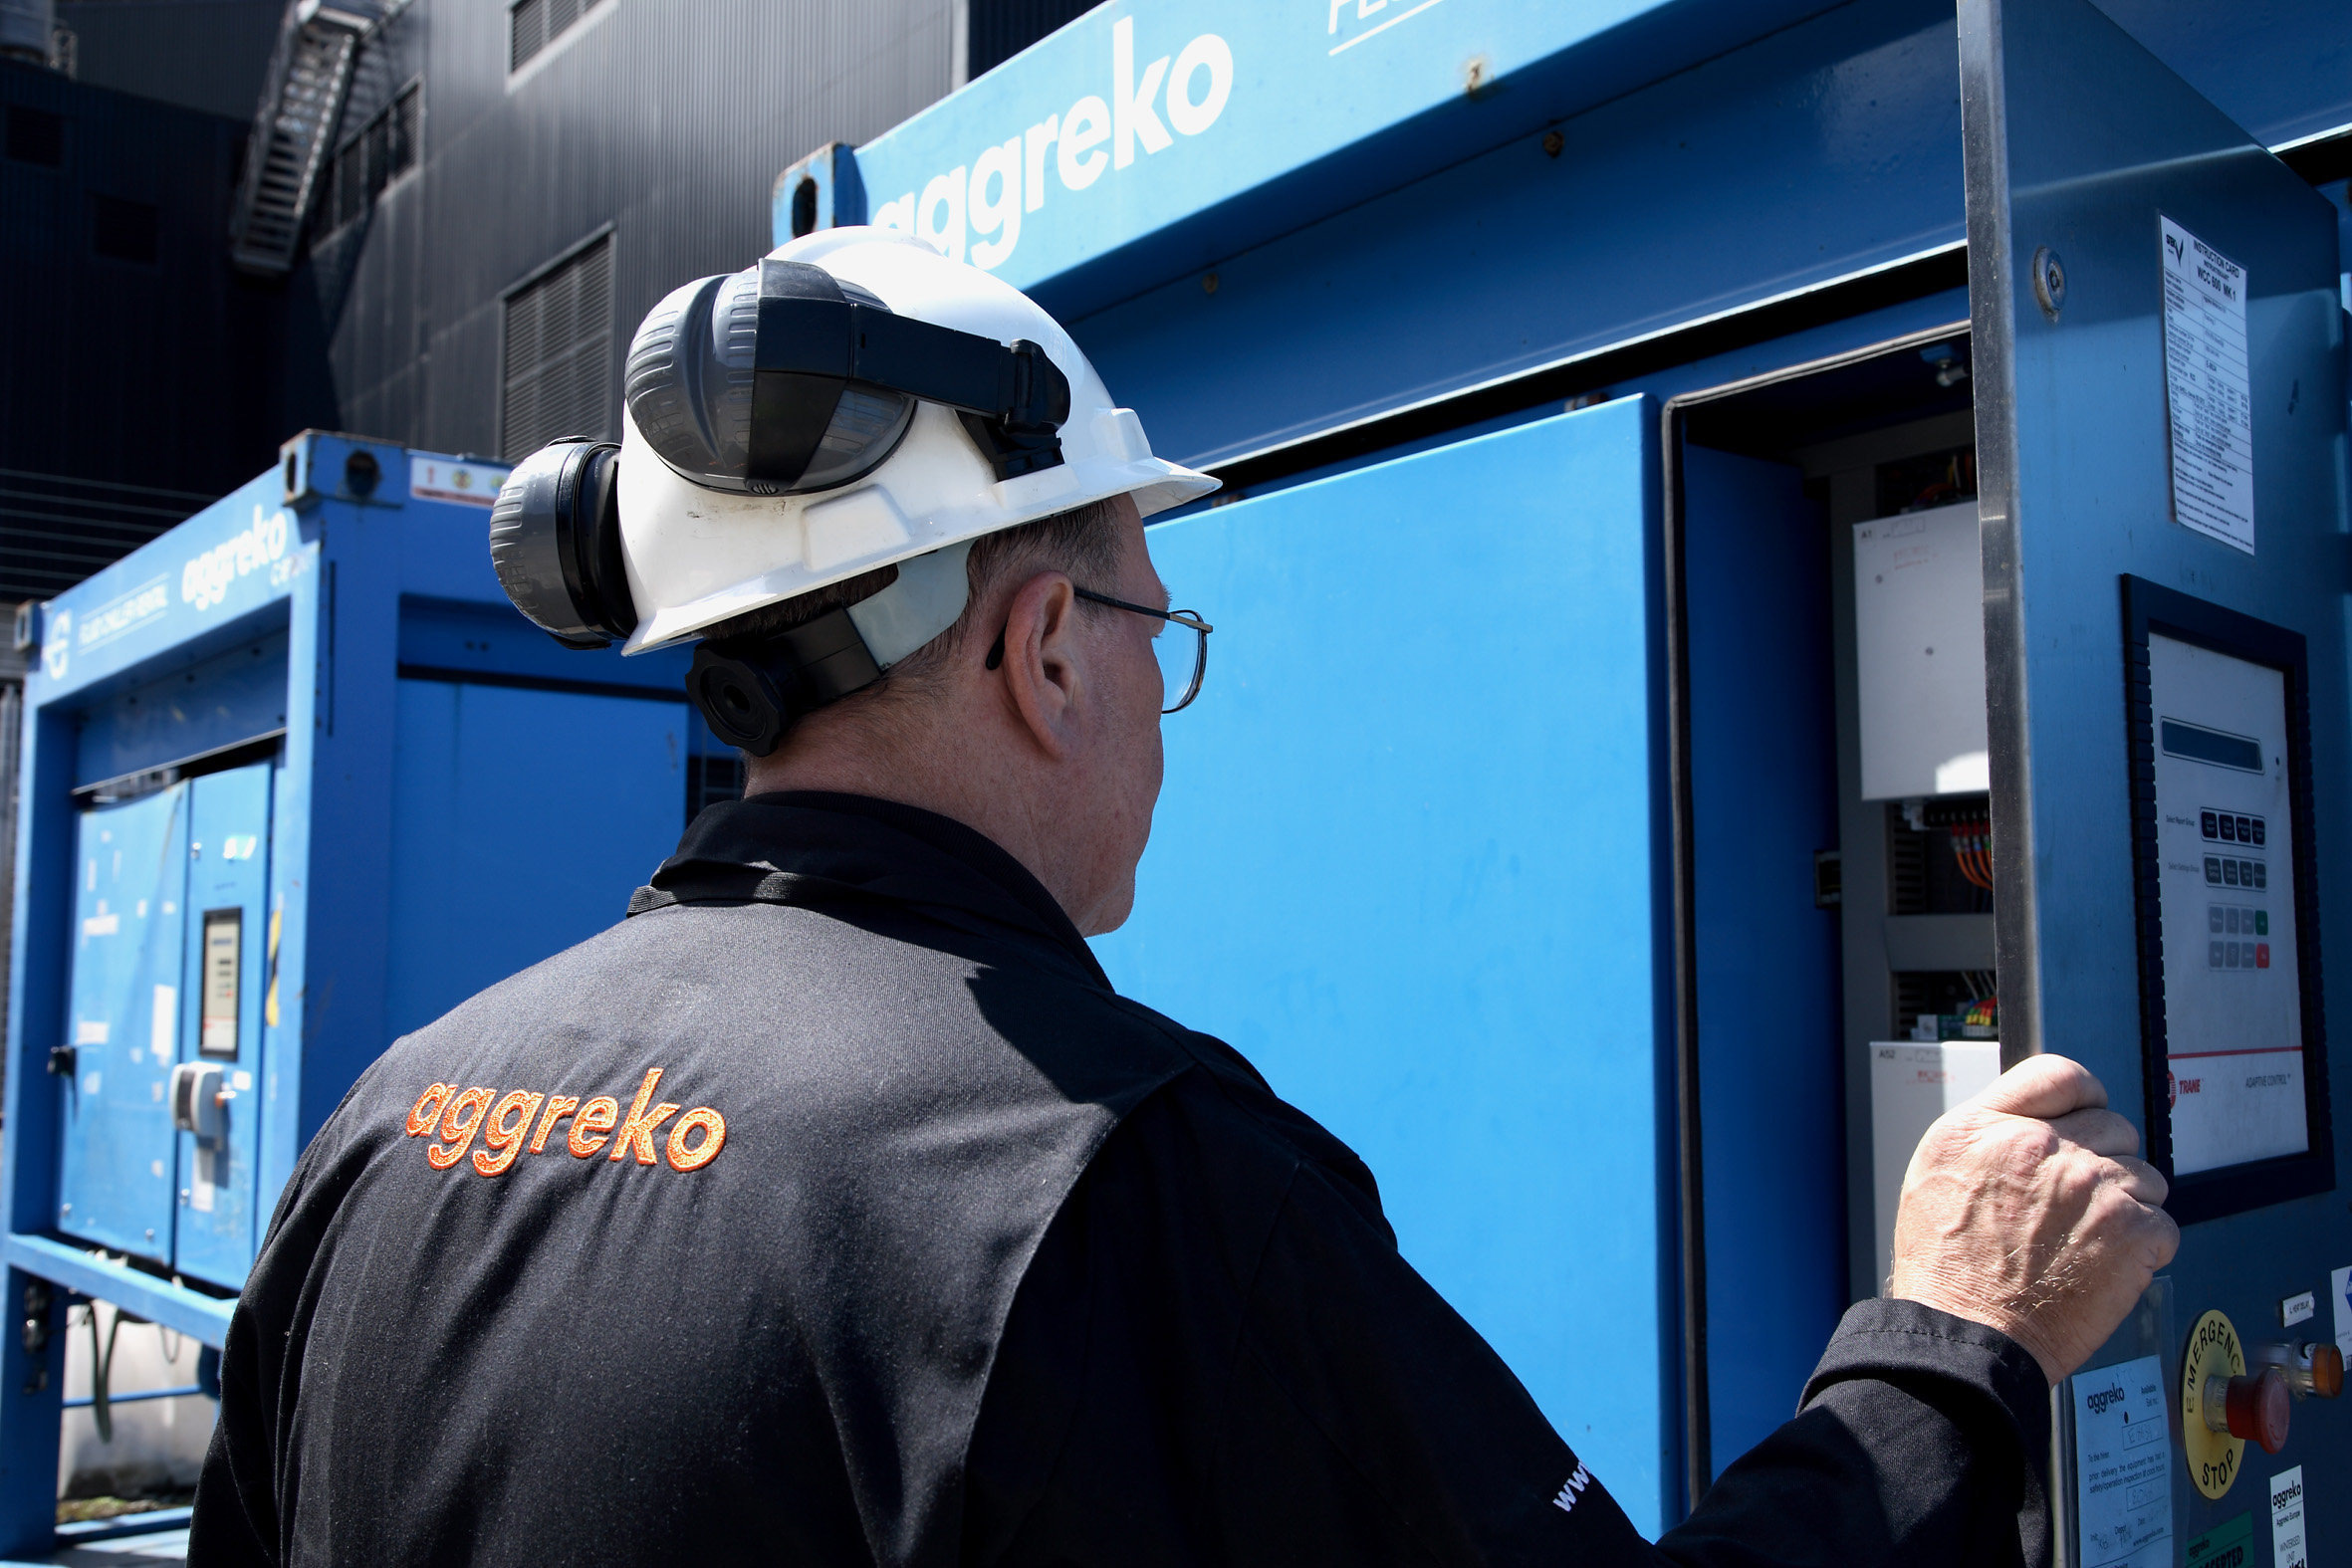 An Aggreko technician checks a power unit